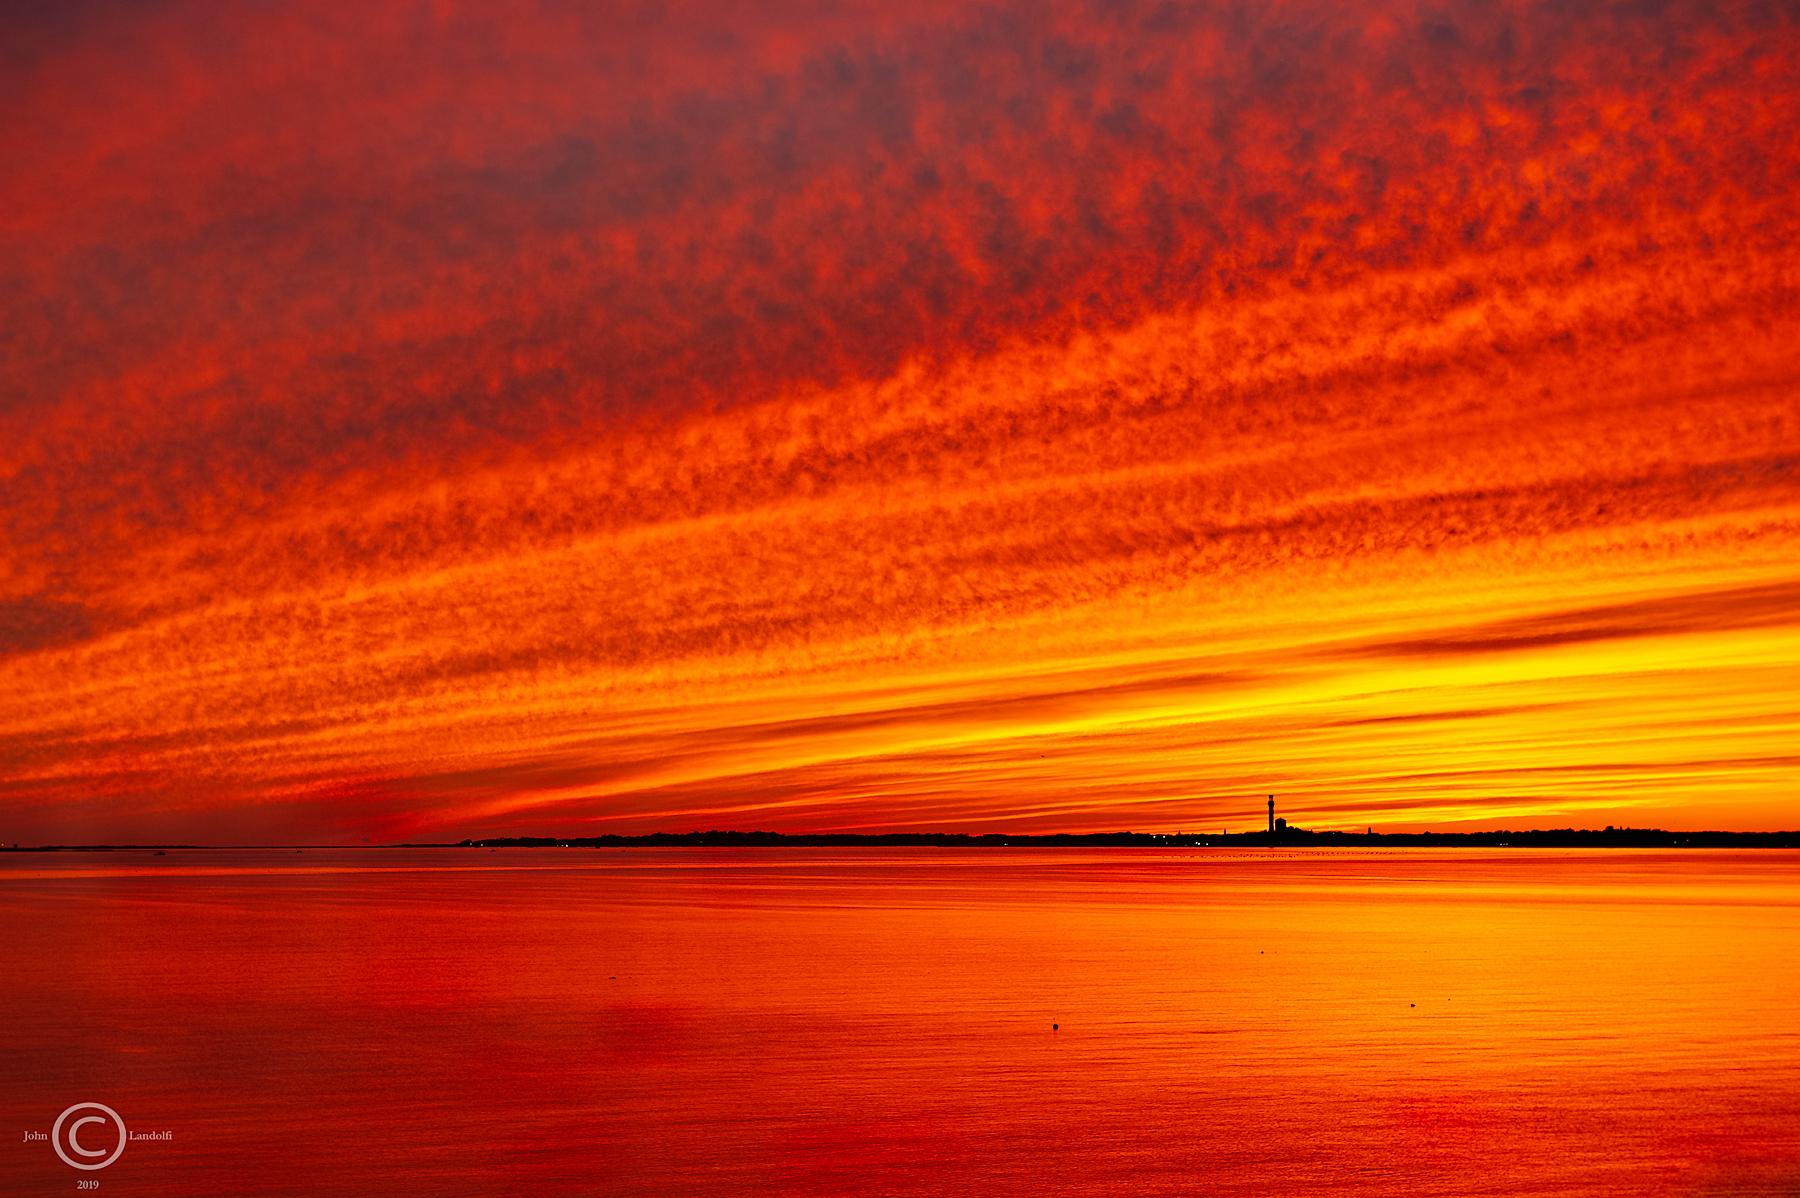 Cape-Cod-2019-Sunset-No4